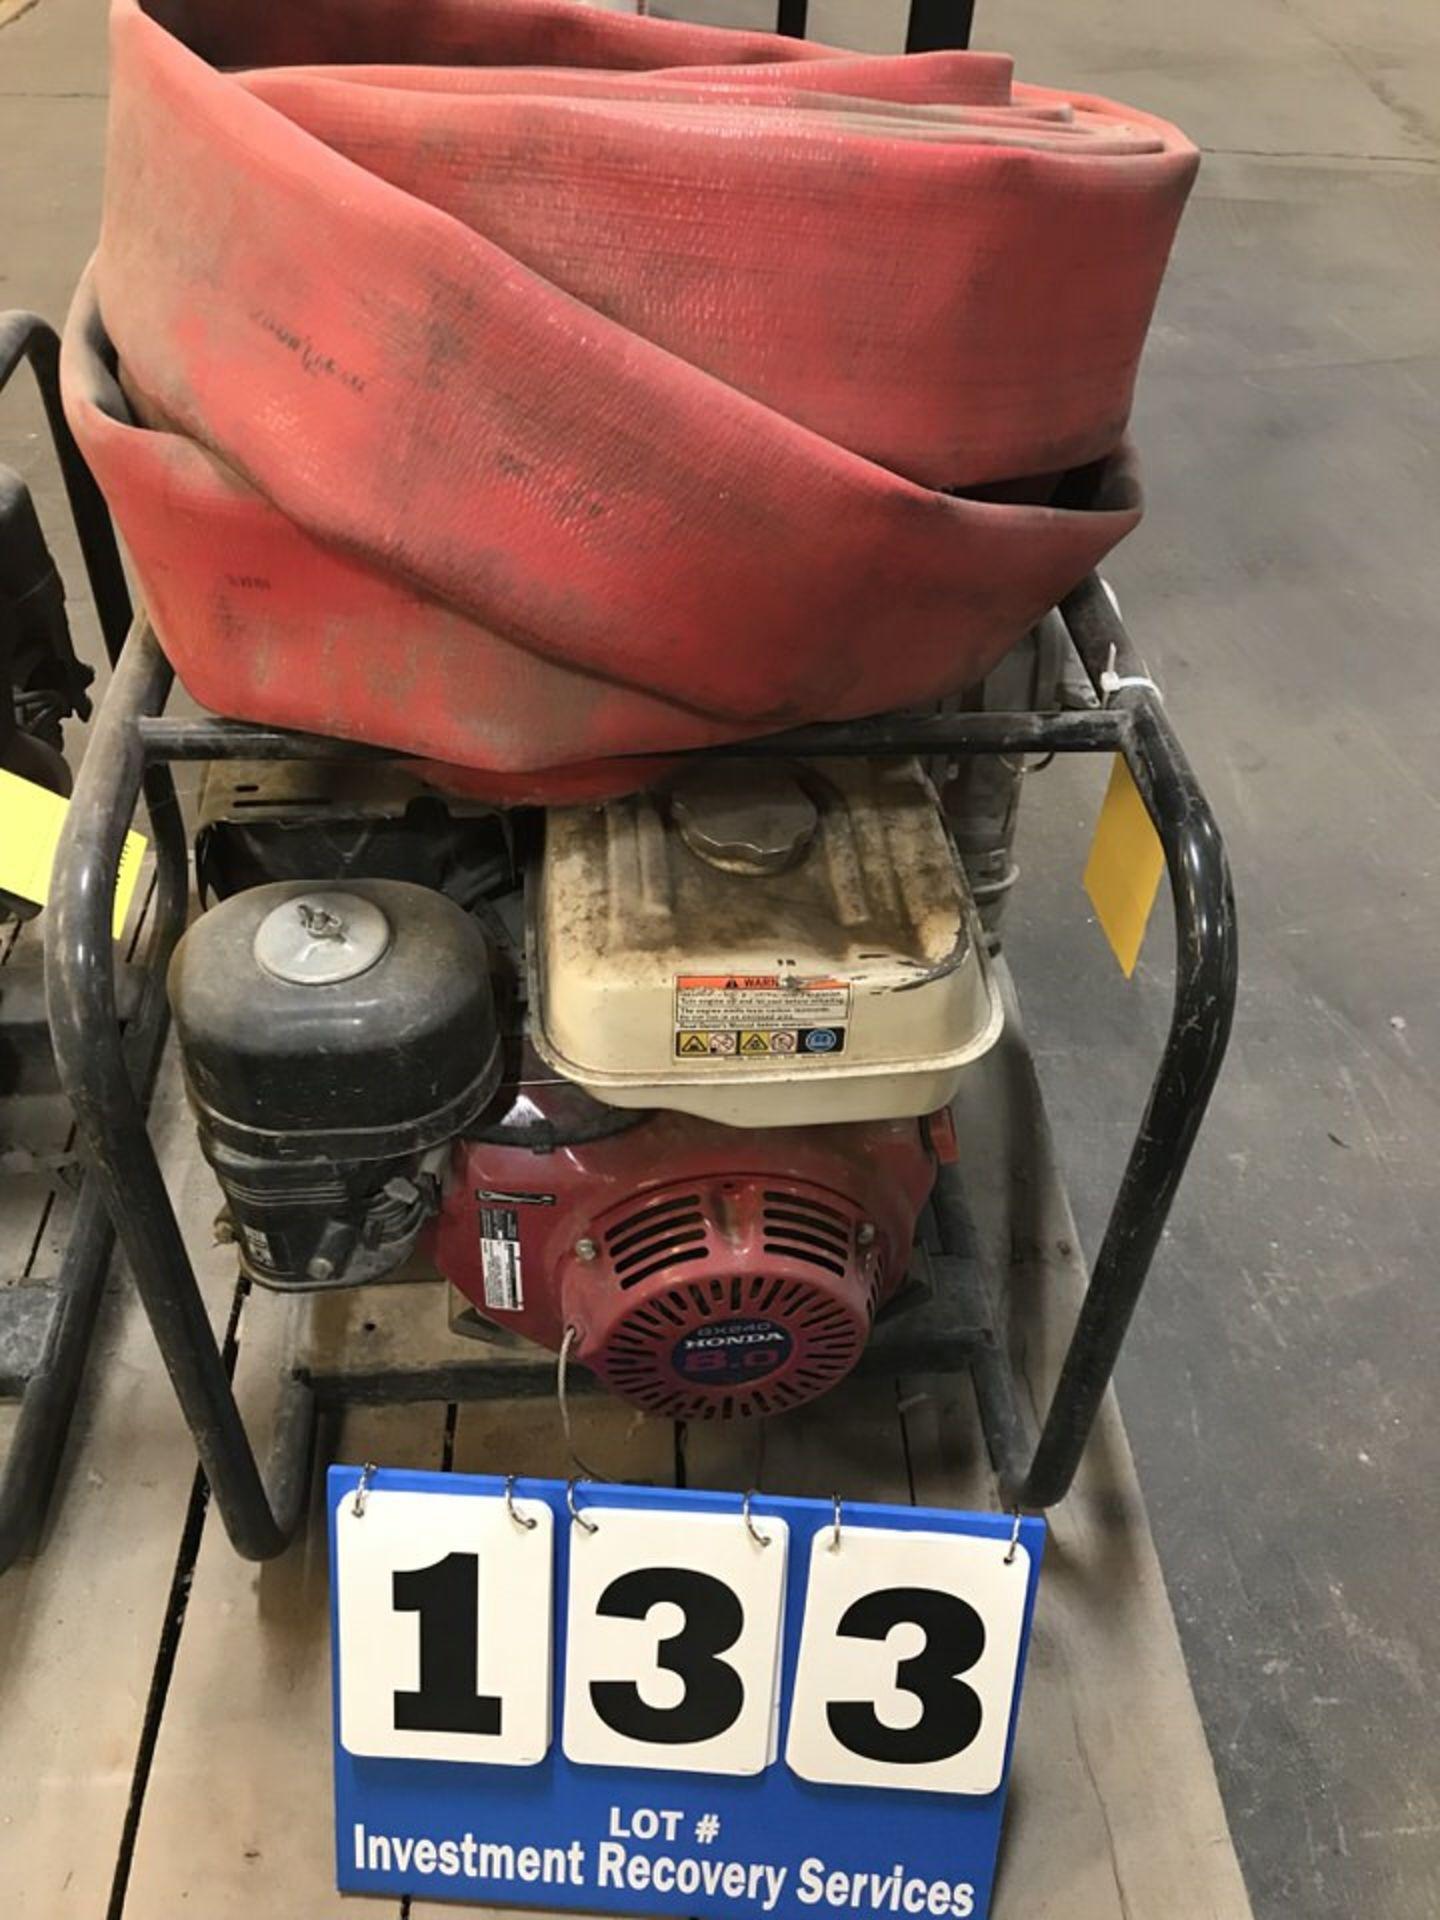 Lot 133 - Honda GX240 Pump w/ Hose (LOCATION: 3421 N SYLVANIA, FT WORTH, TX, 76111)